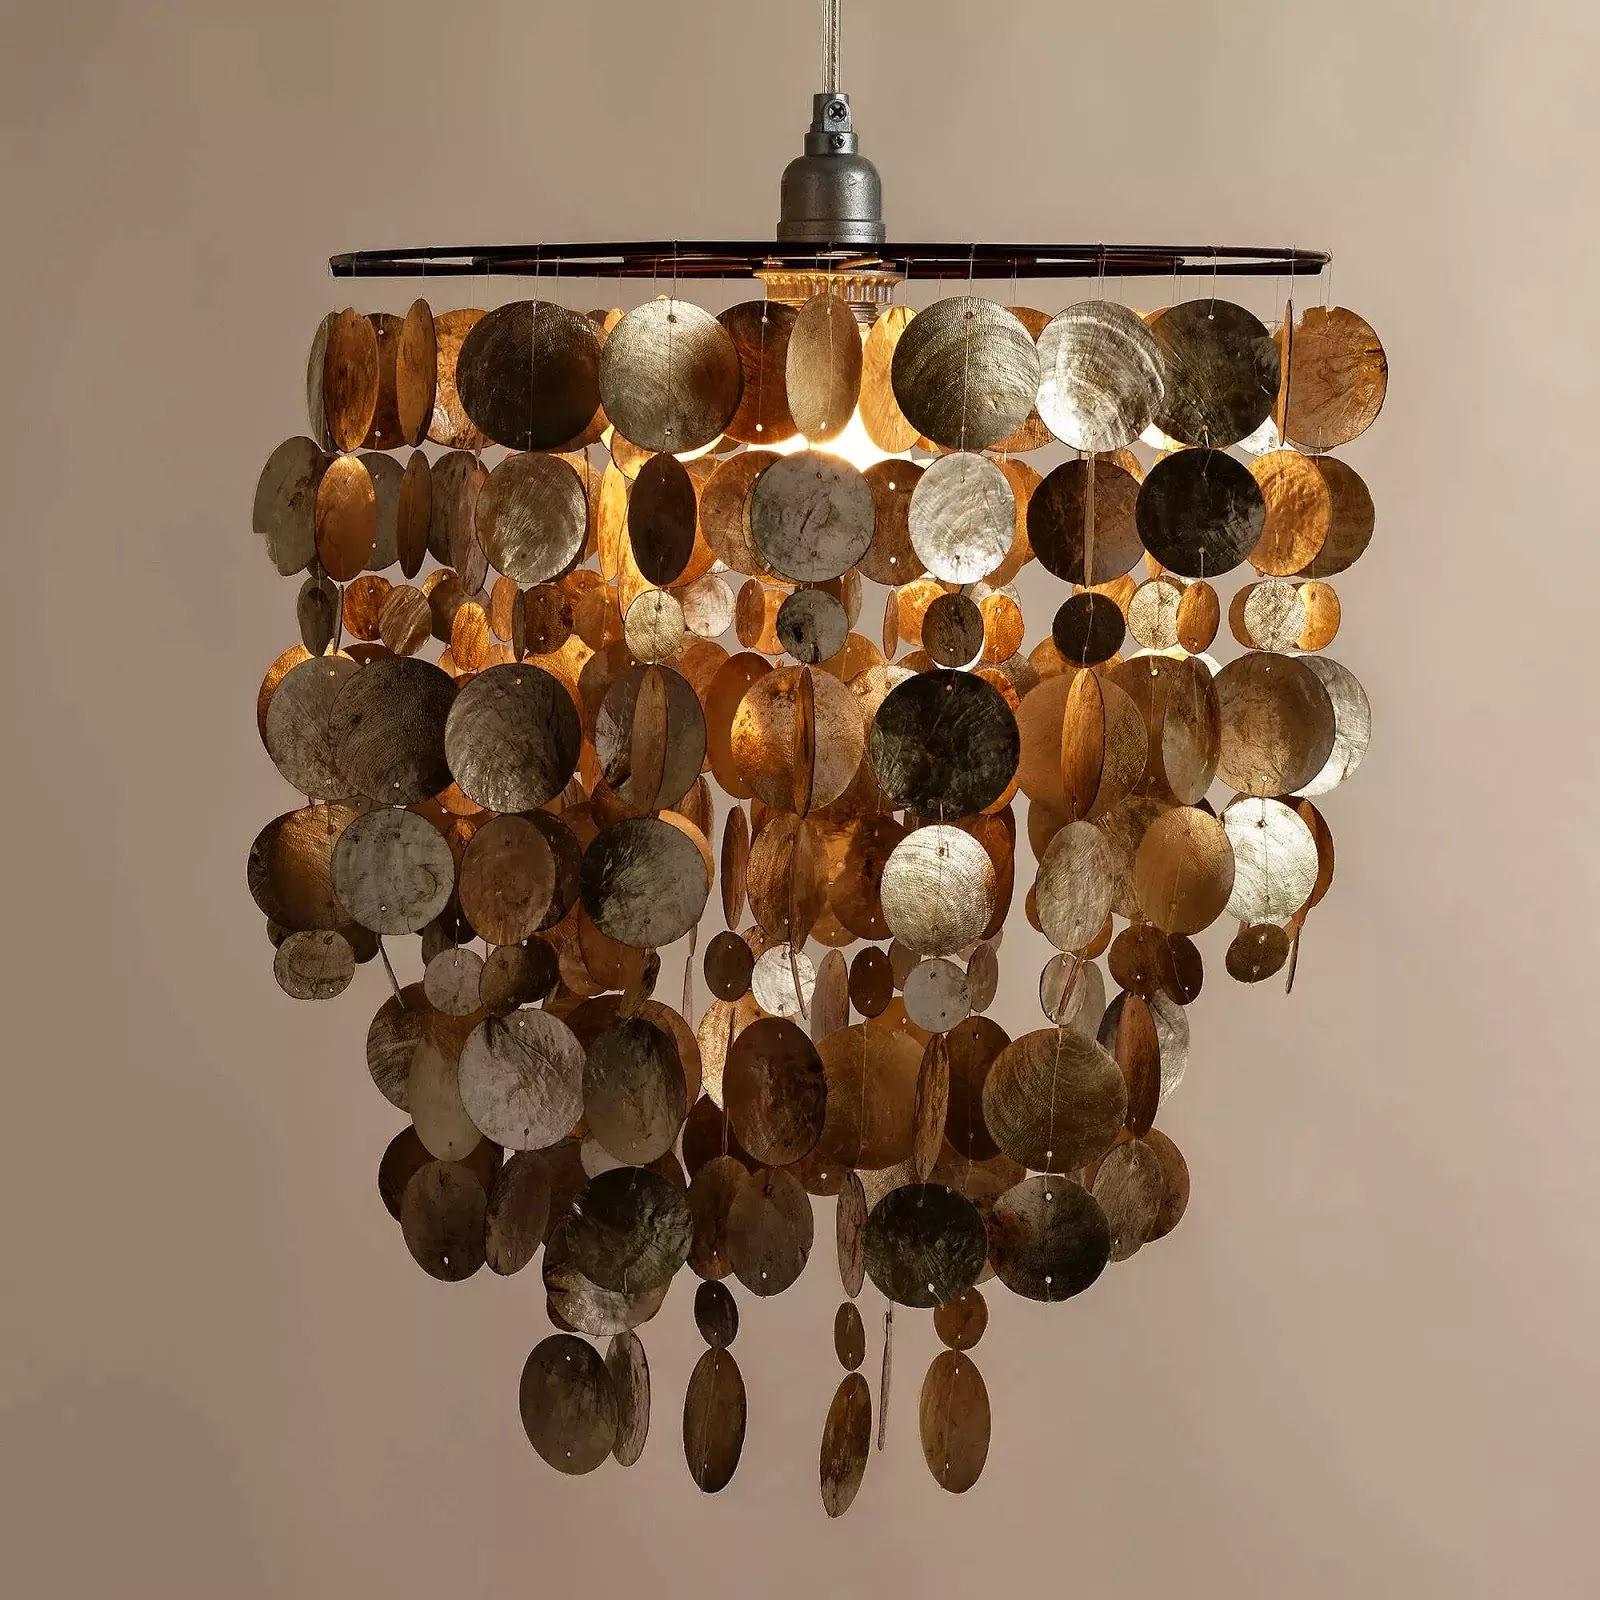 DIY Capiz Shell Chandelier Knock It Off Kim – Capiz Shell Chandelier Lighting